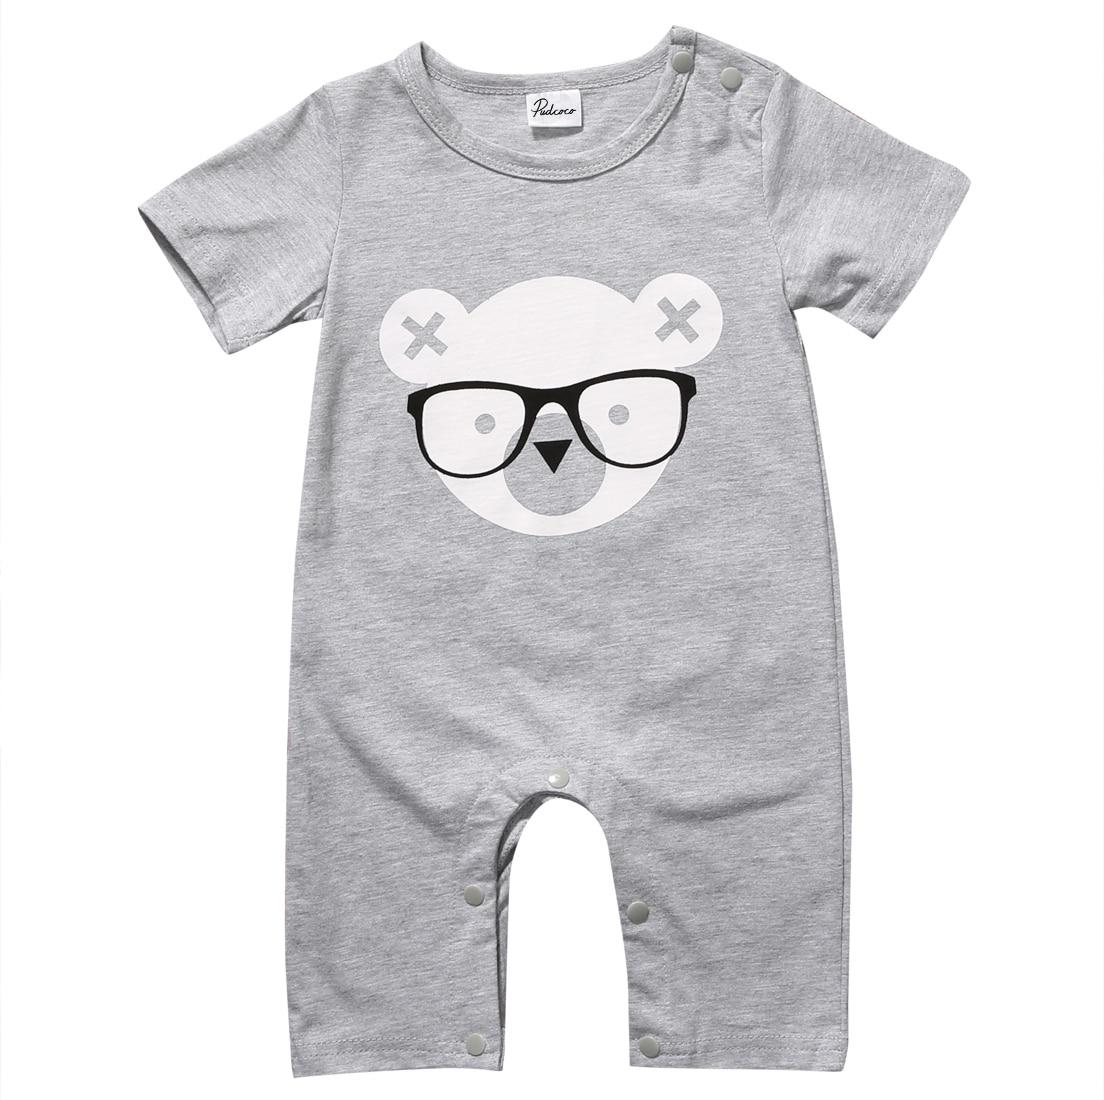 Baby Boy Kids Short Sleeve Bear Print Romper Cute Cotton Rompers Summer